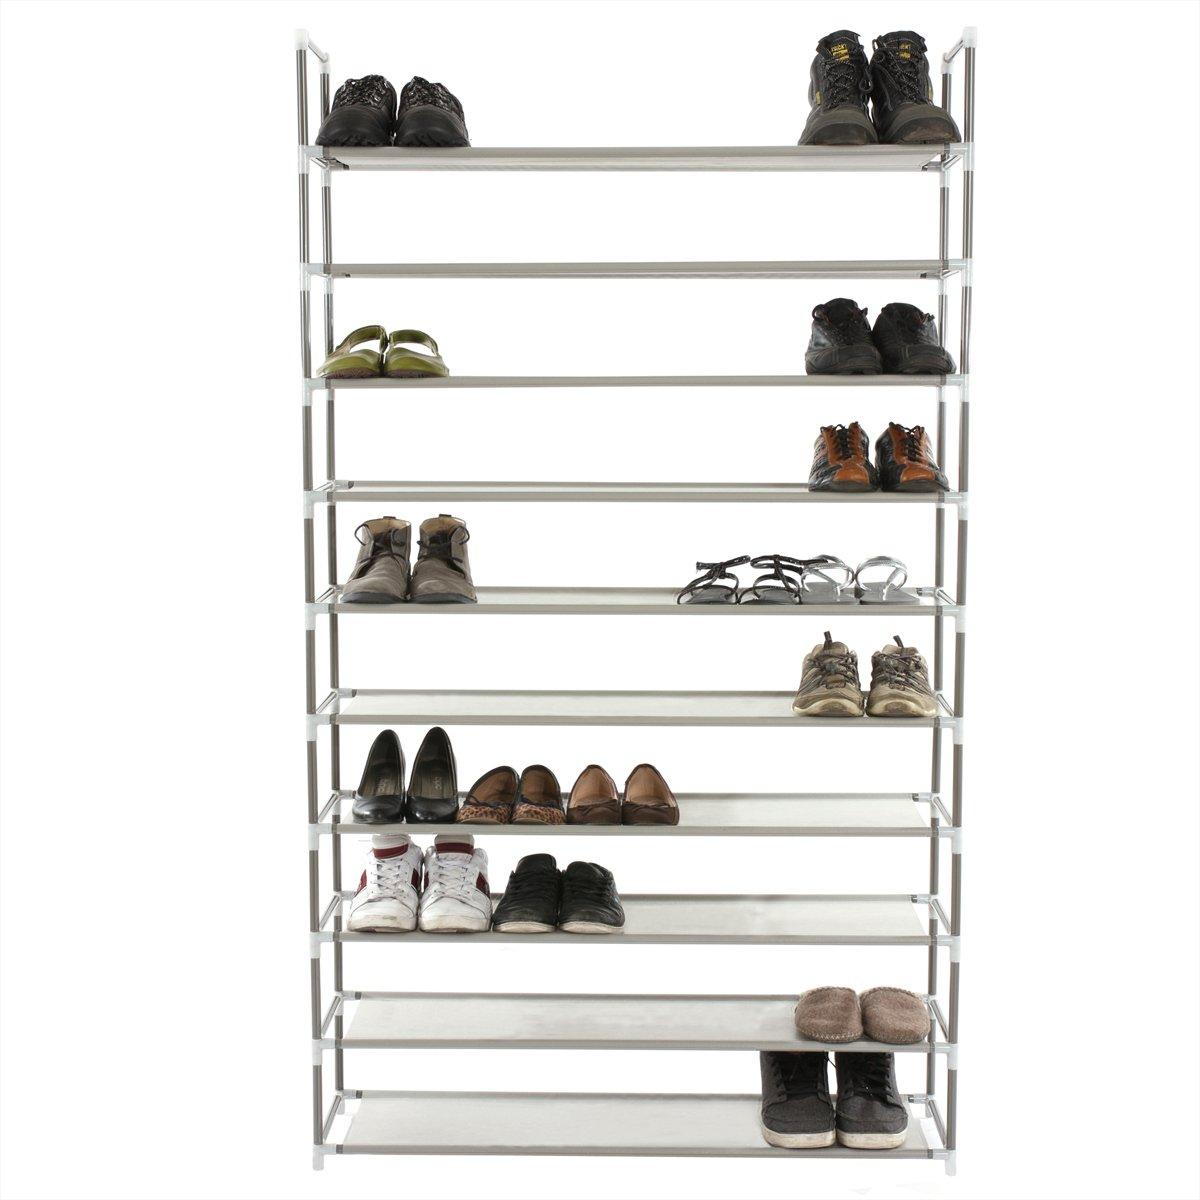 Zapatero para 50 pares de zapatos y 10 niveles for Zapatero para guardar zapatos